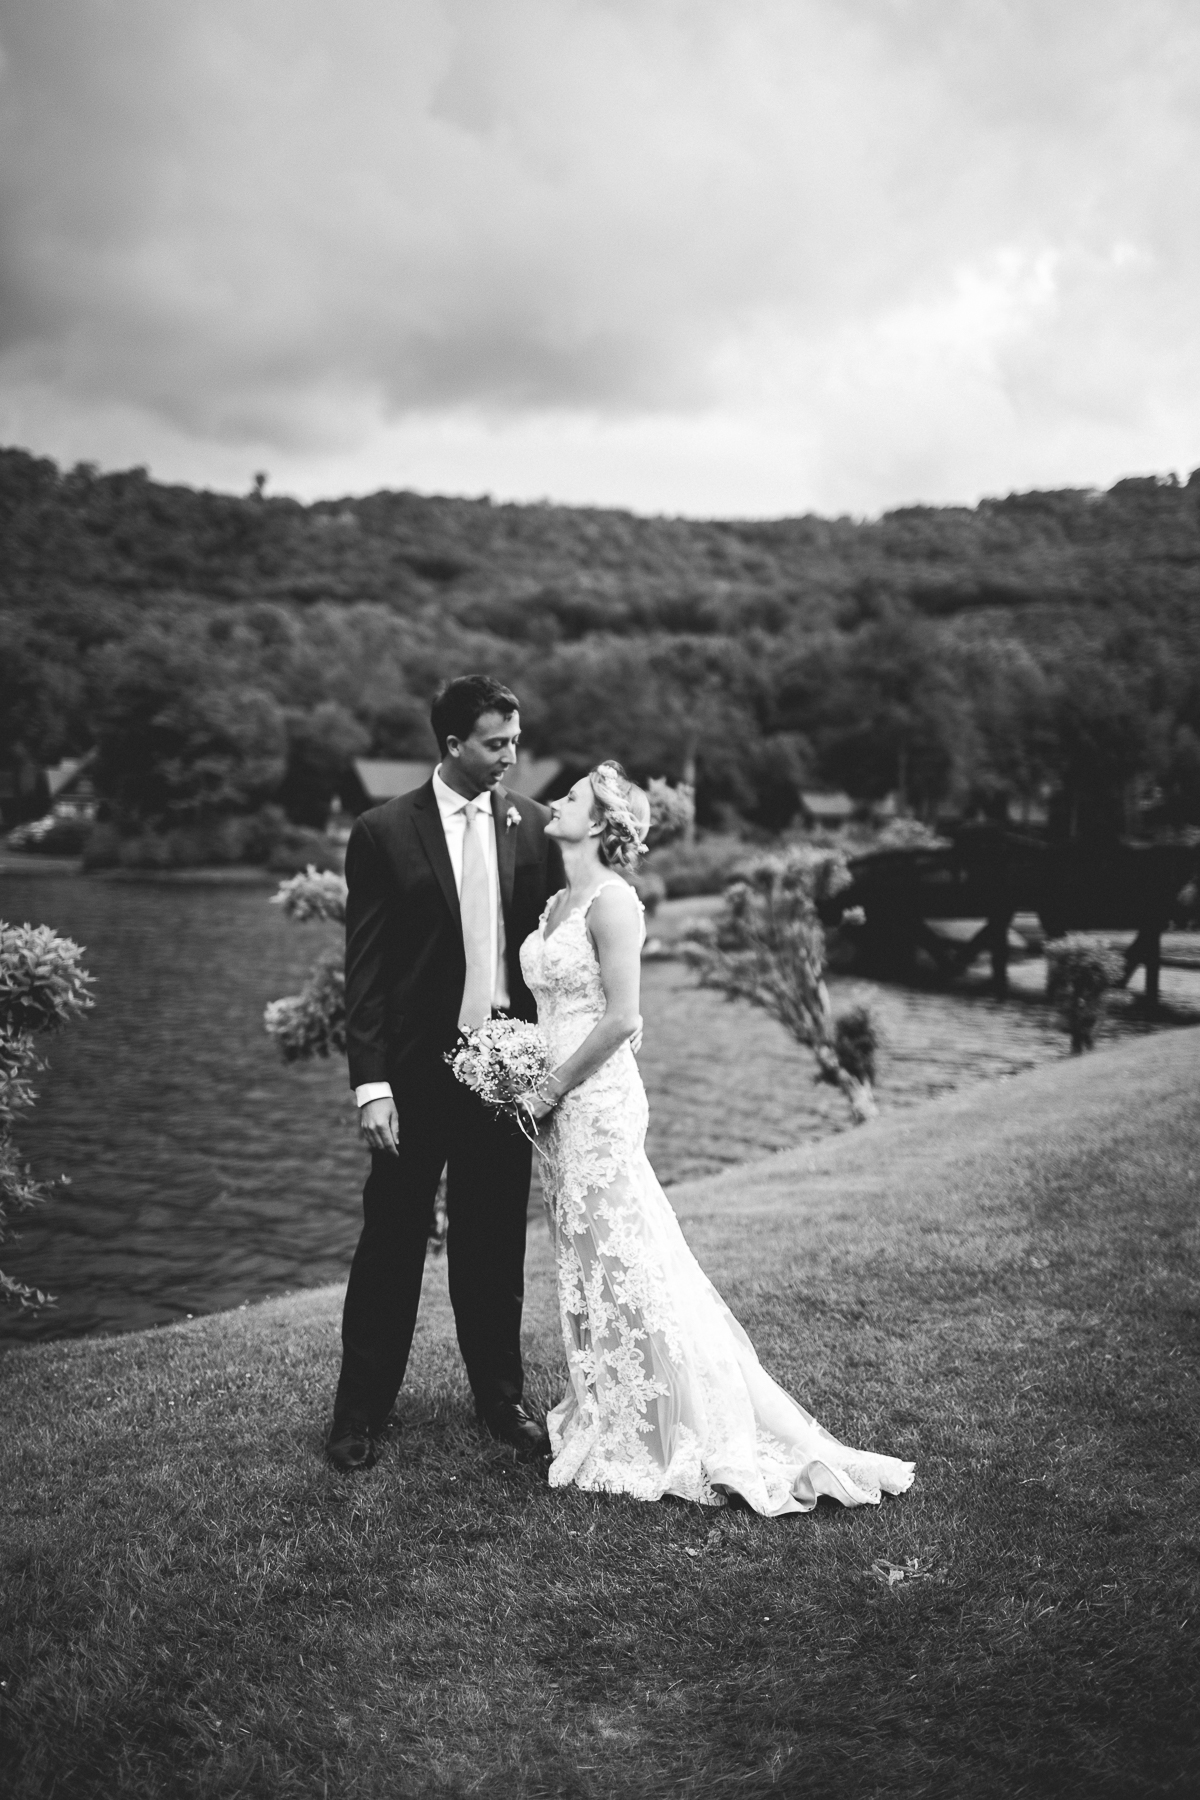 taylor-travis-grandfather-mountain-kelley-raye-north-carolina-wedding-photographer-45.jpg